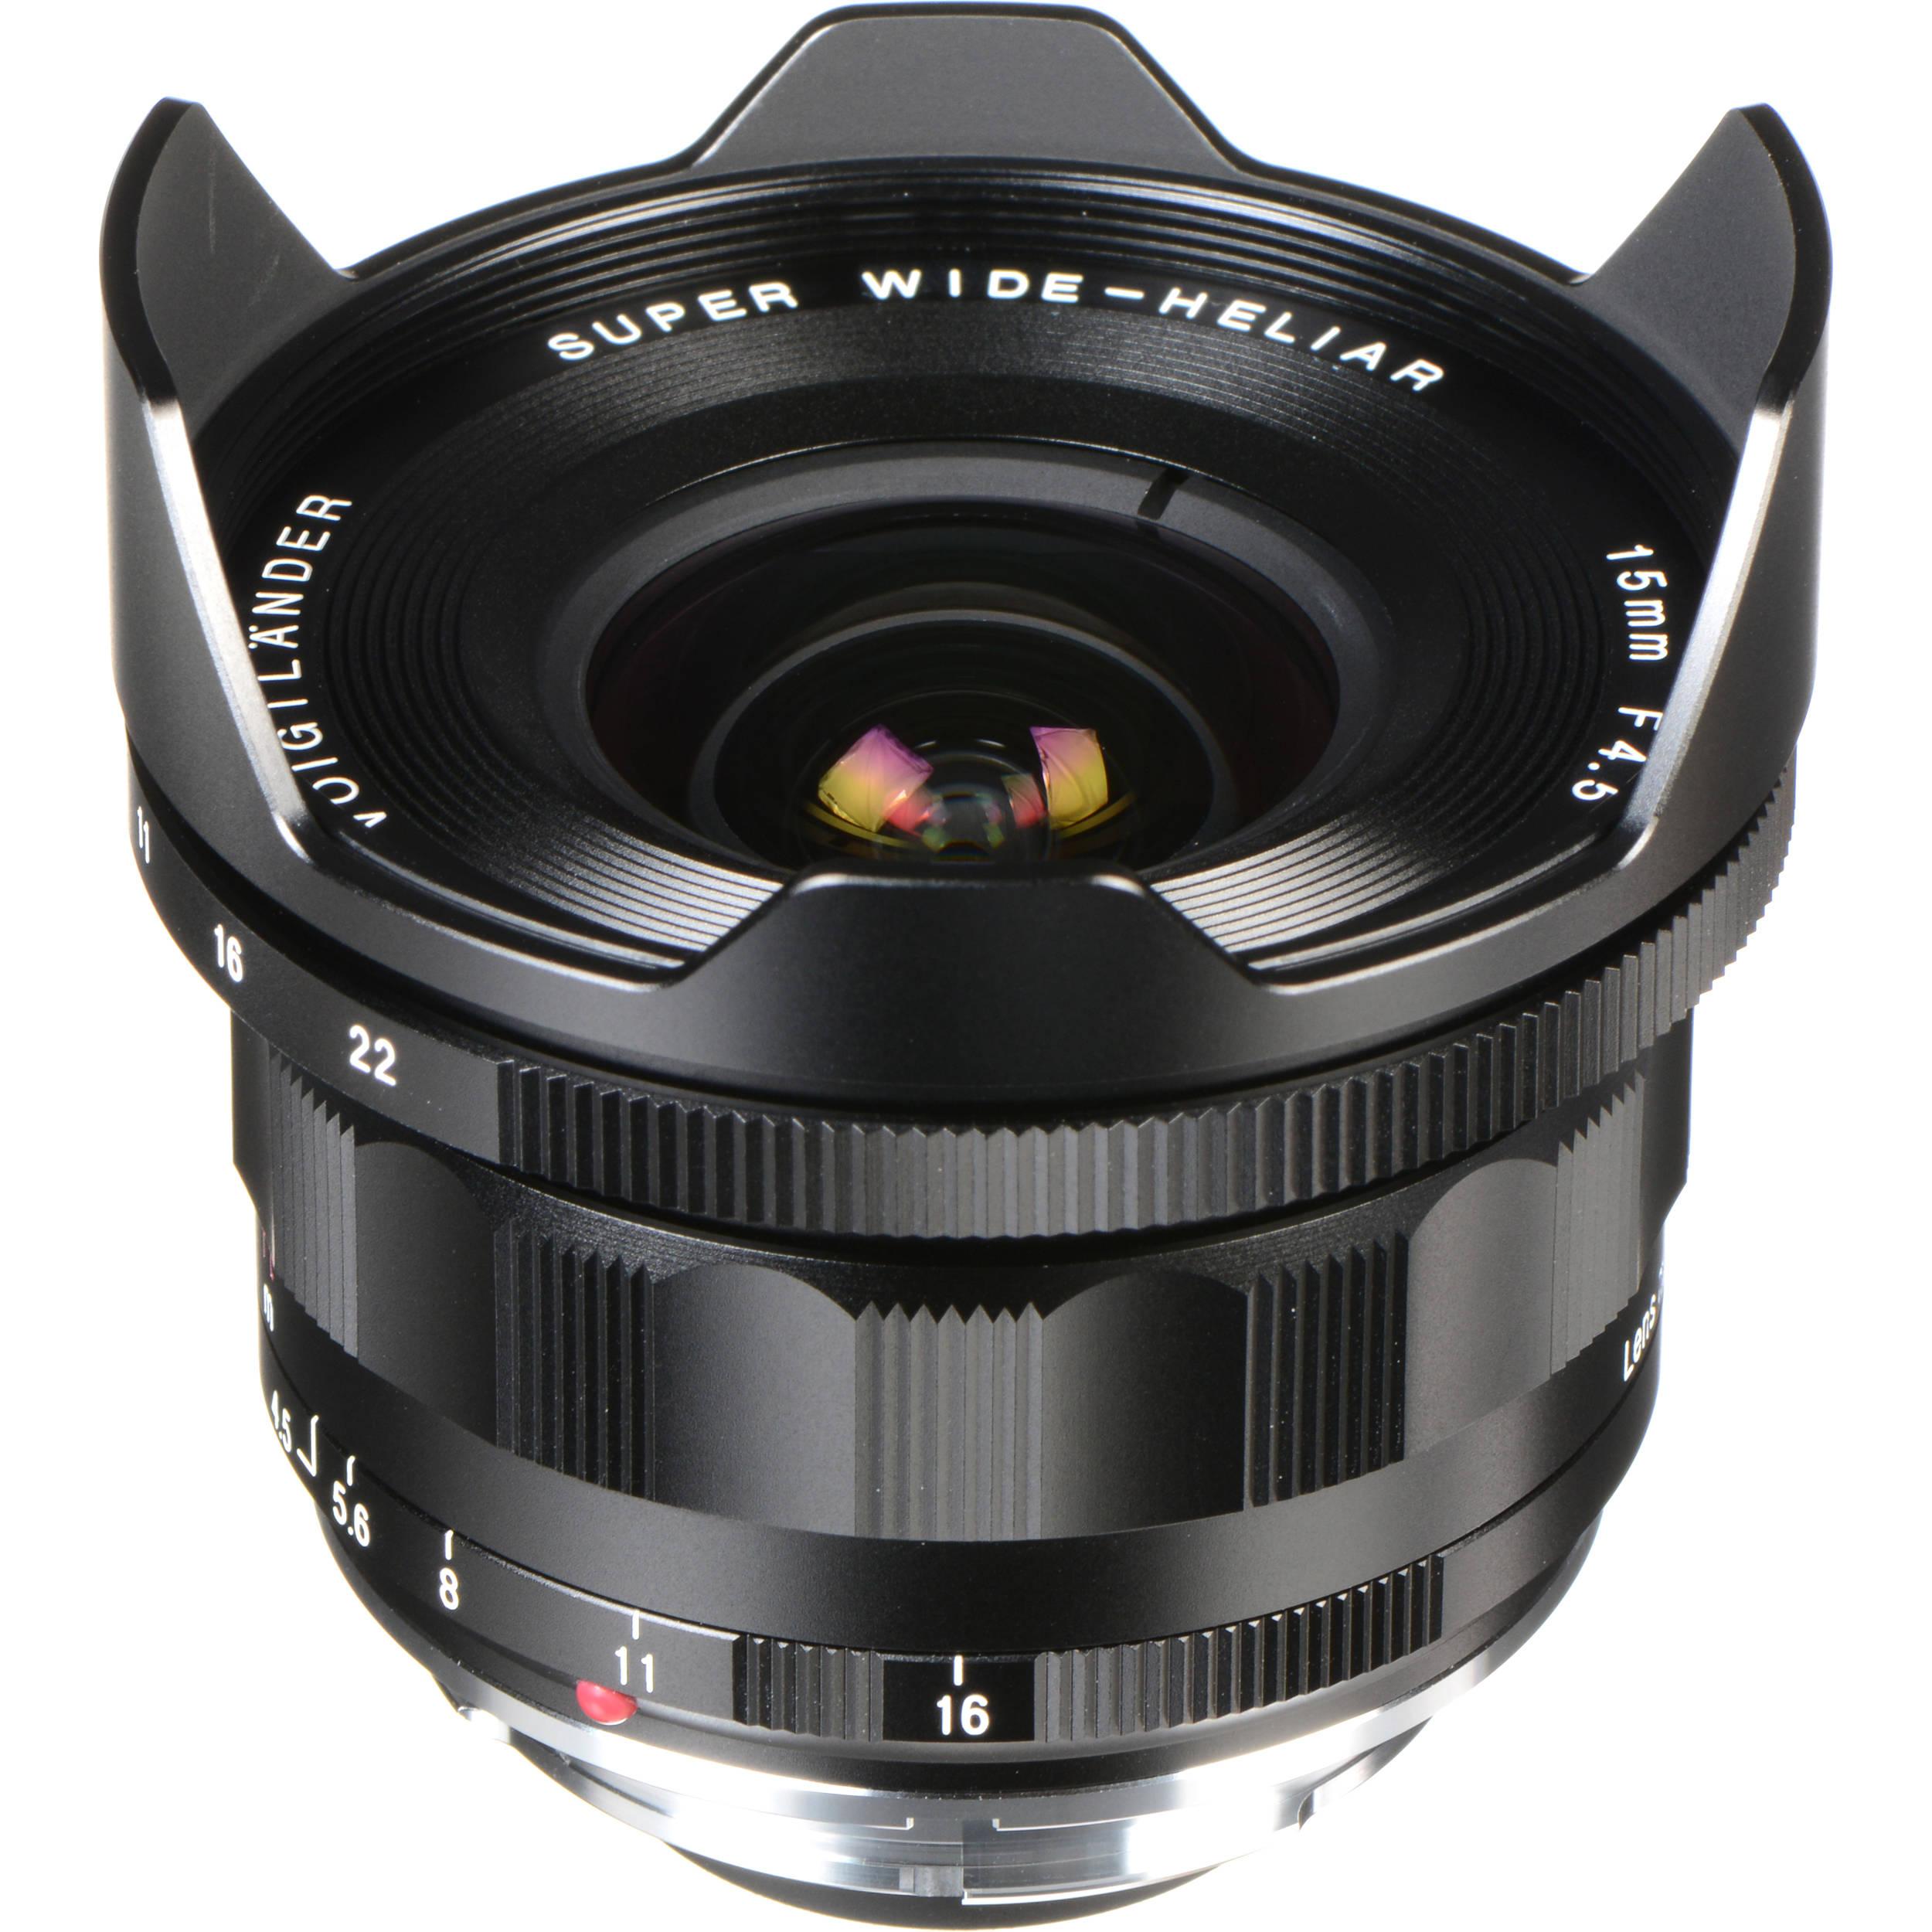 Super Wide Heliar 15mm F 45 Aspherical Iii Lens Click Image For Larger Versionnamediagramjpgviews1317size156 Kbid Voigtlander